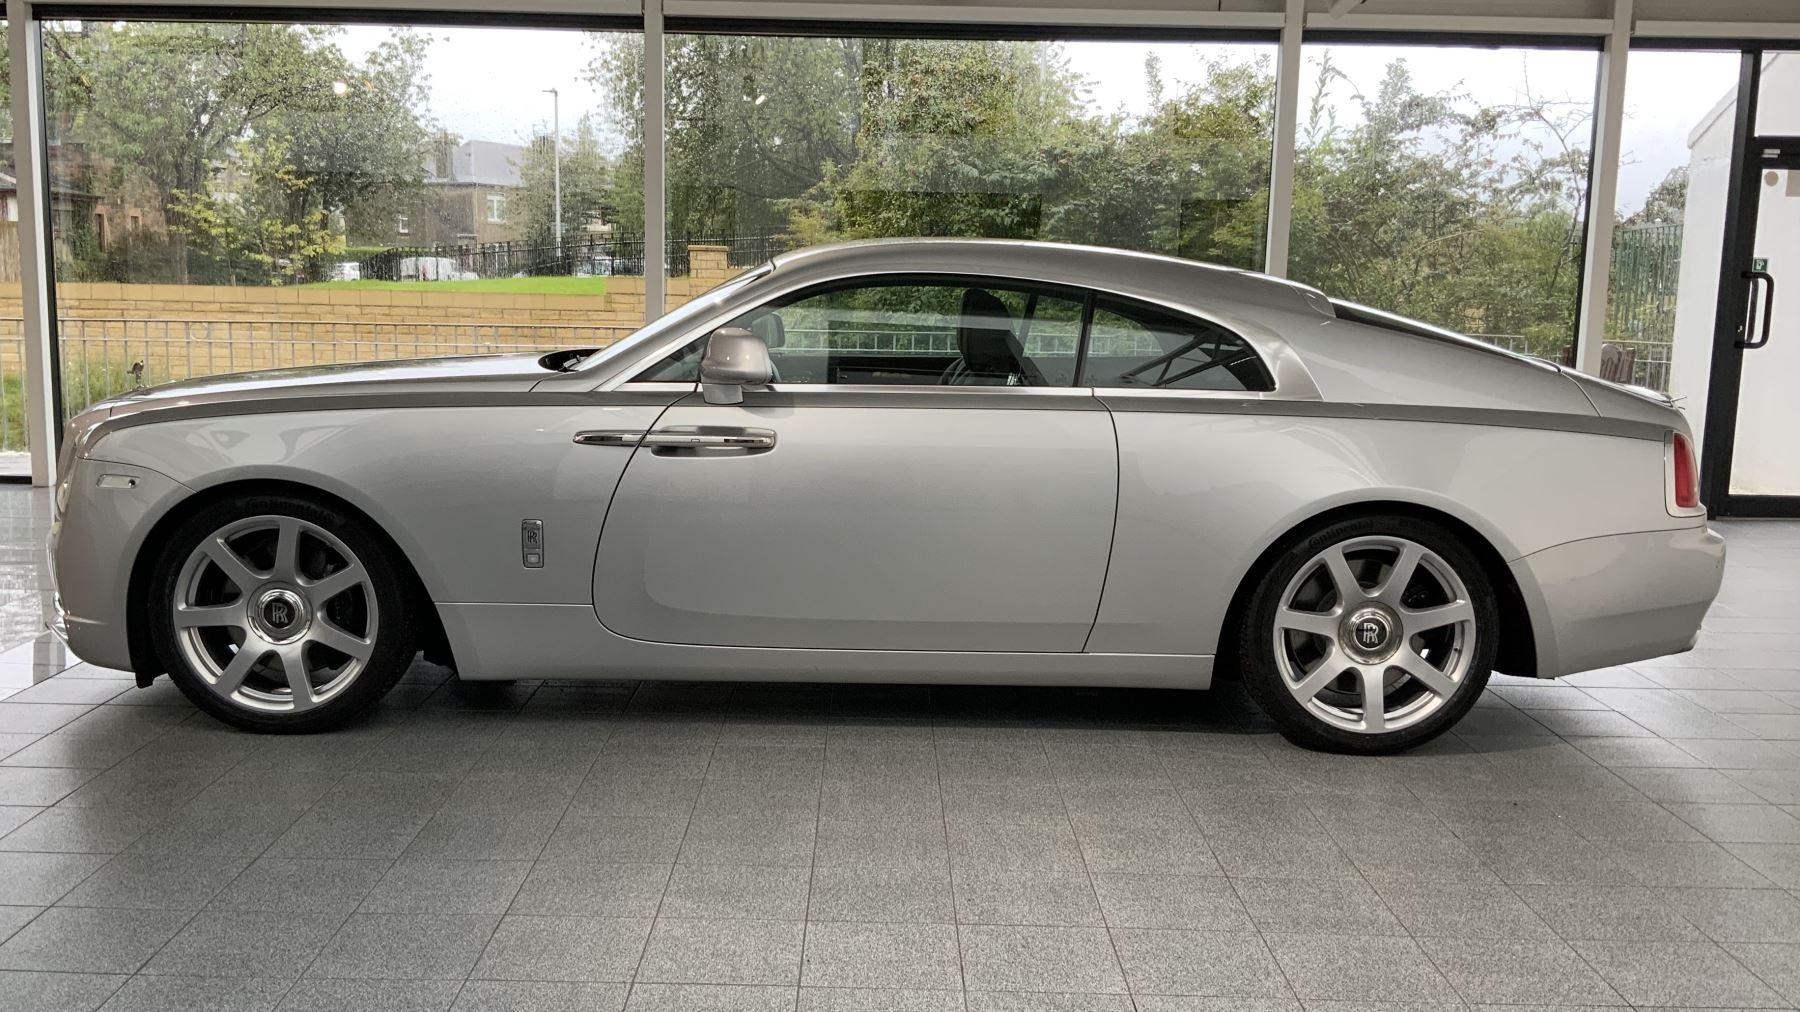 Rolls-Royce Wraith V12 image 2